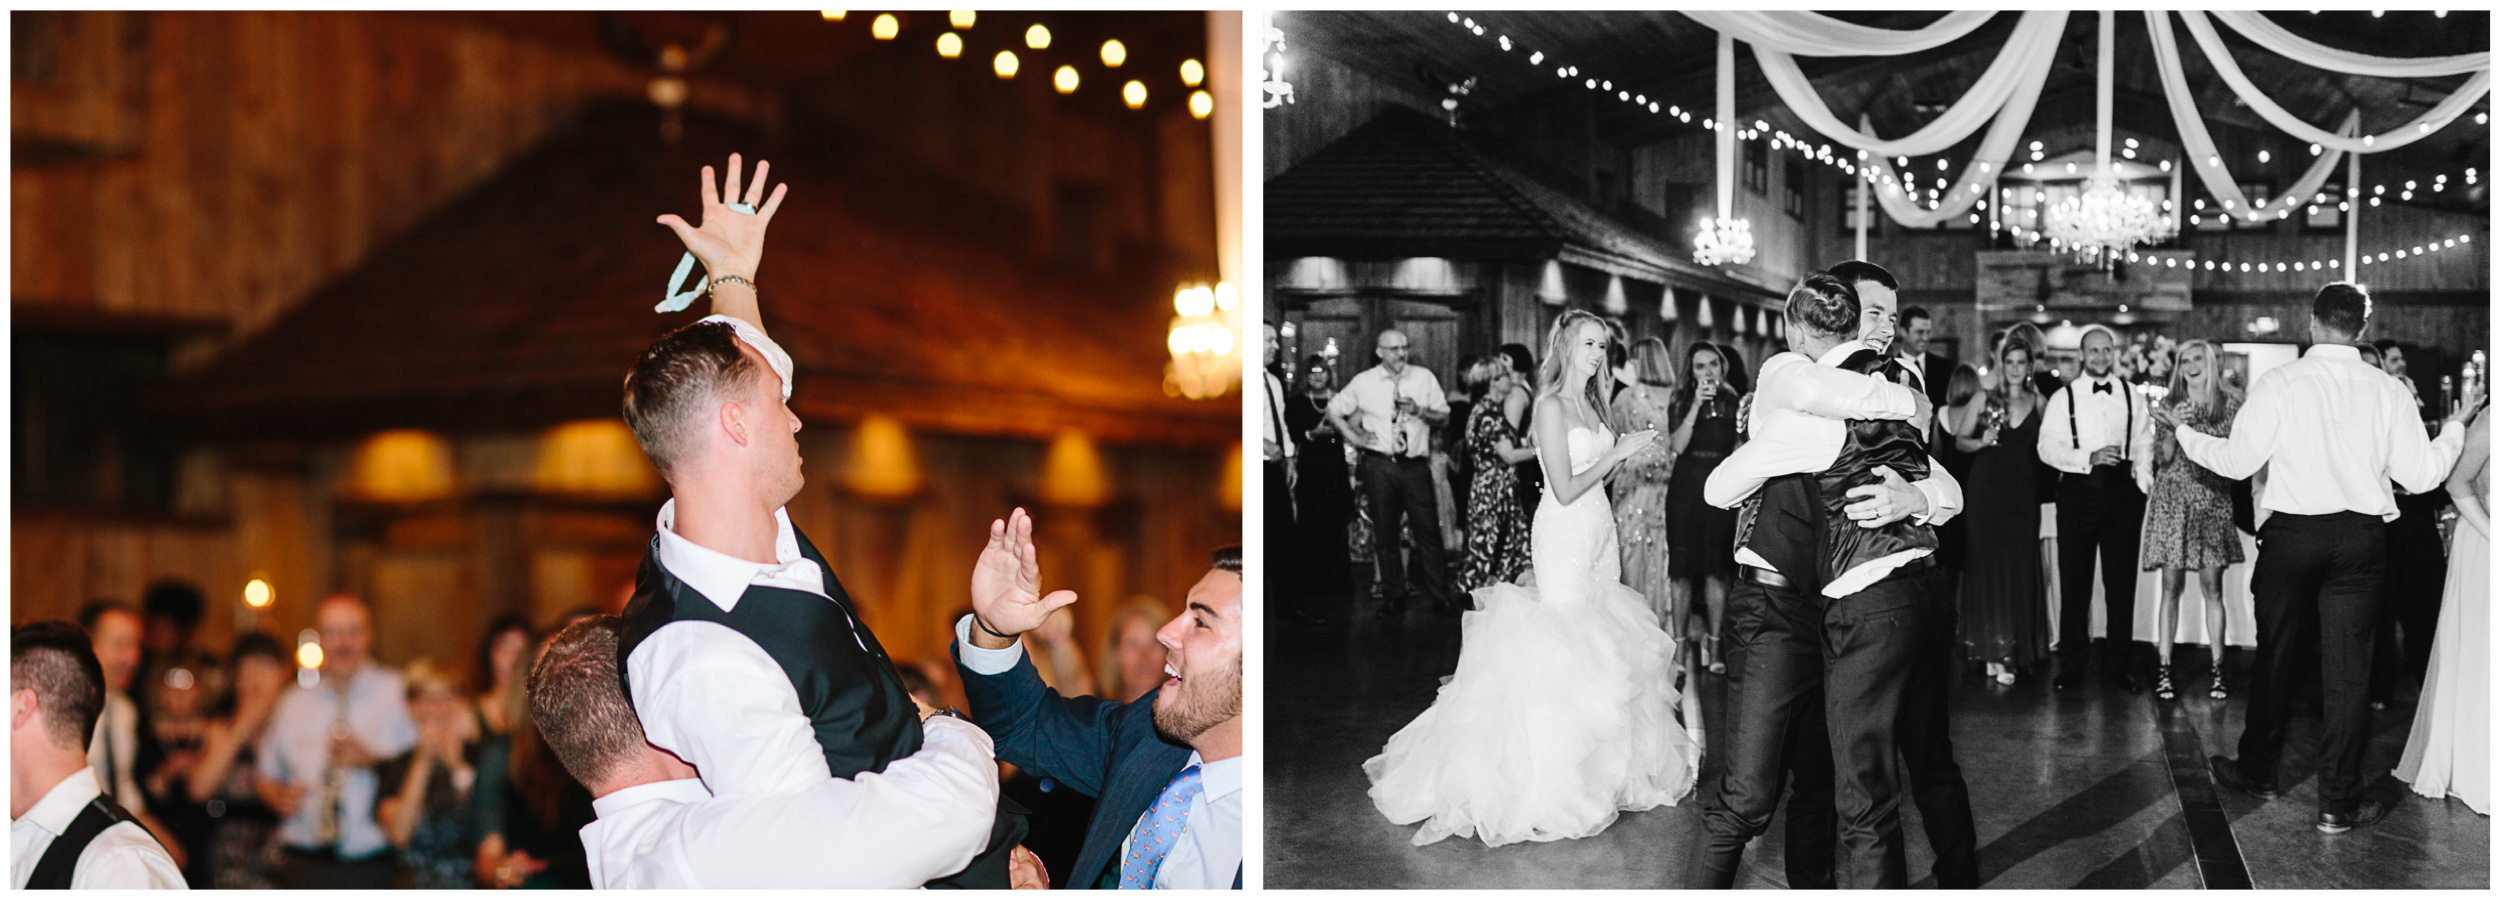 spruce_mountain_ranch_wedding_96.jpg